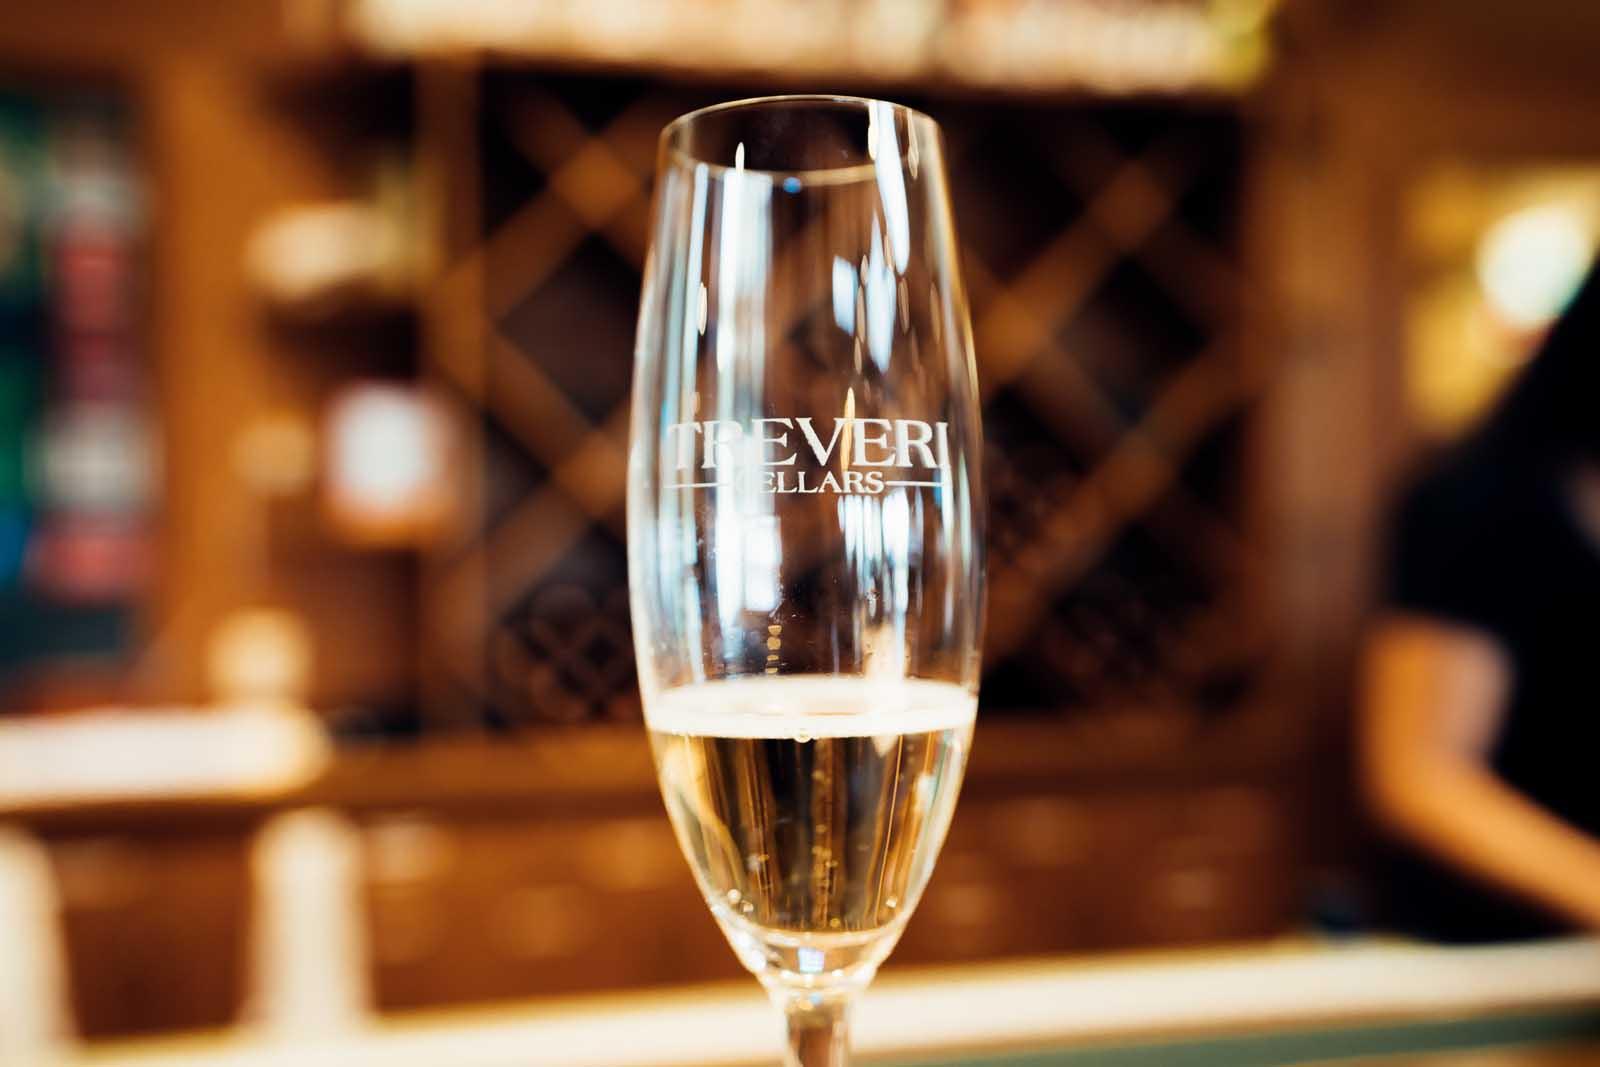 Sparkling Wine Tasting at Treveri Cellars